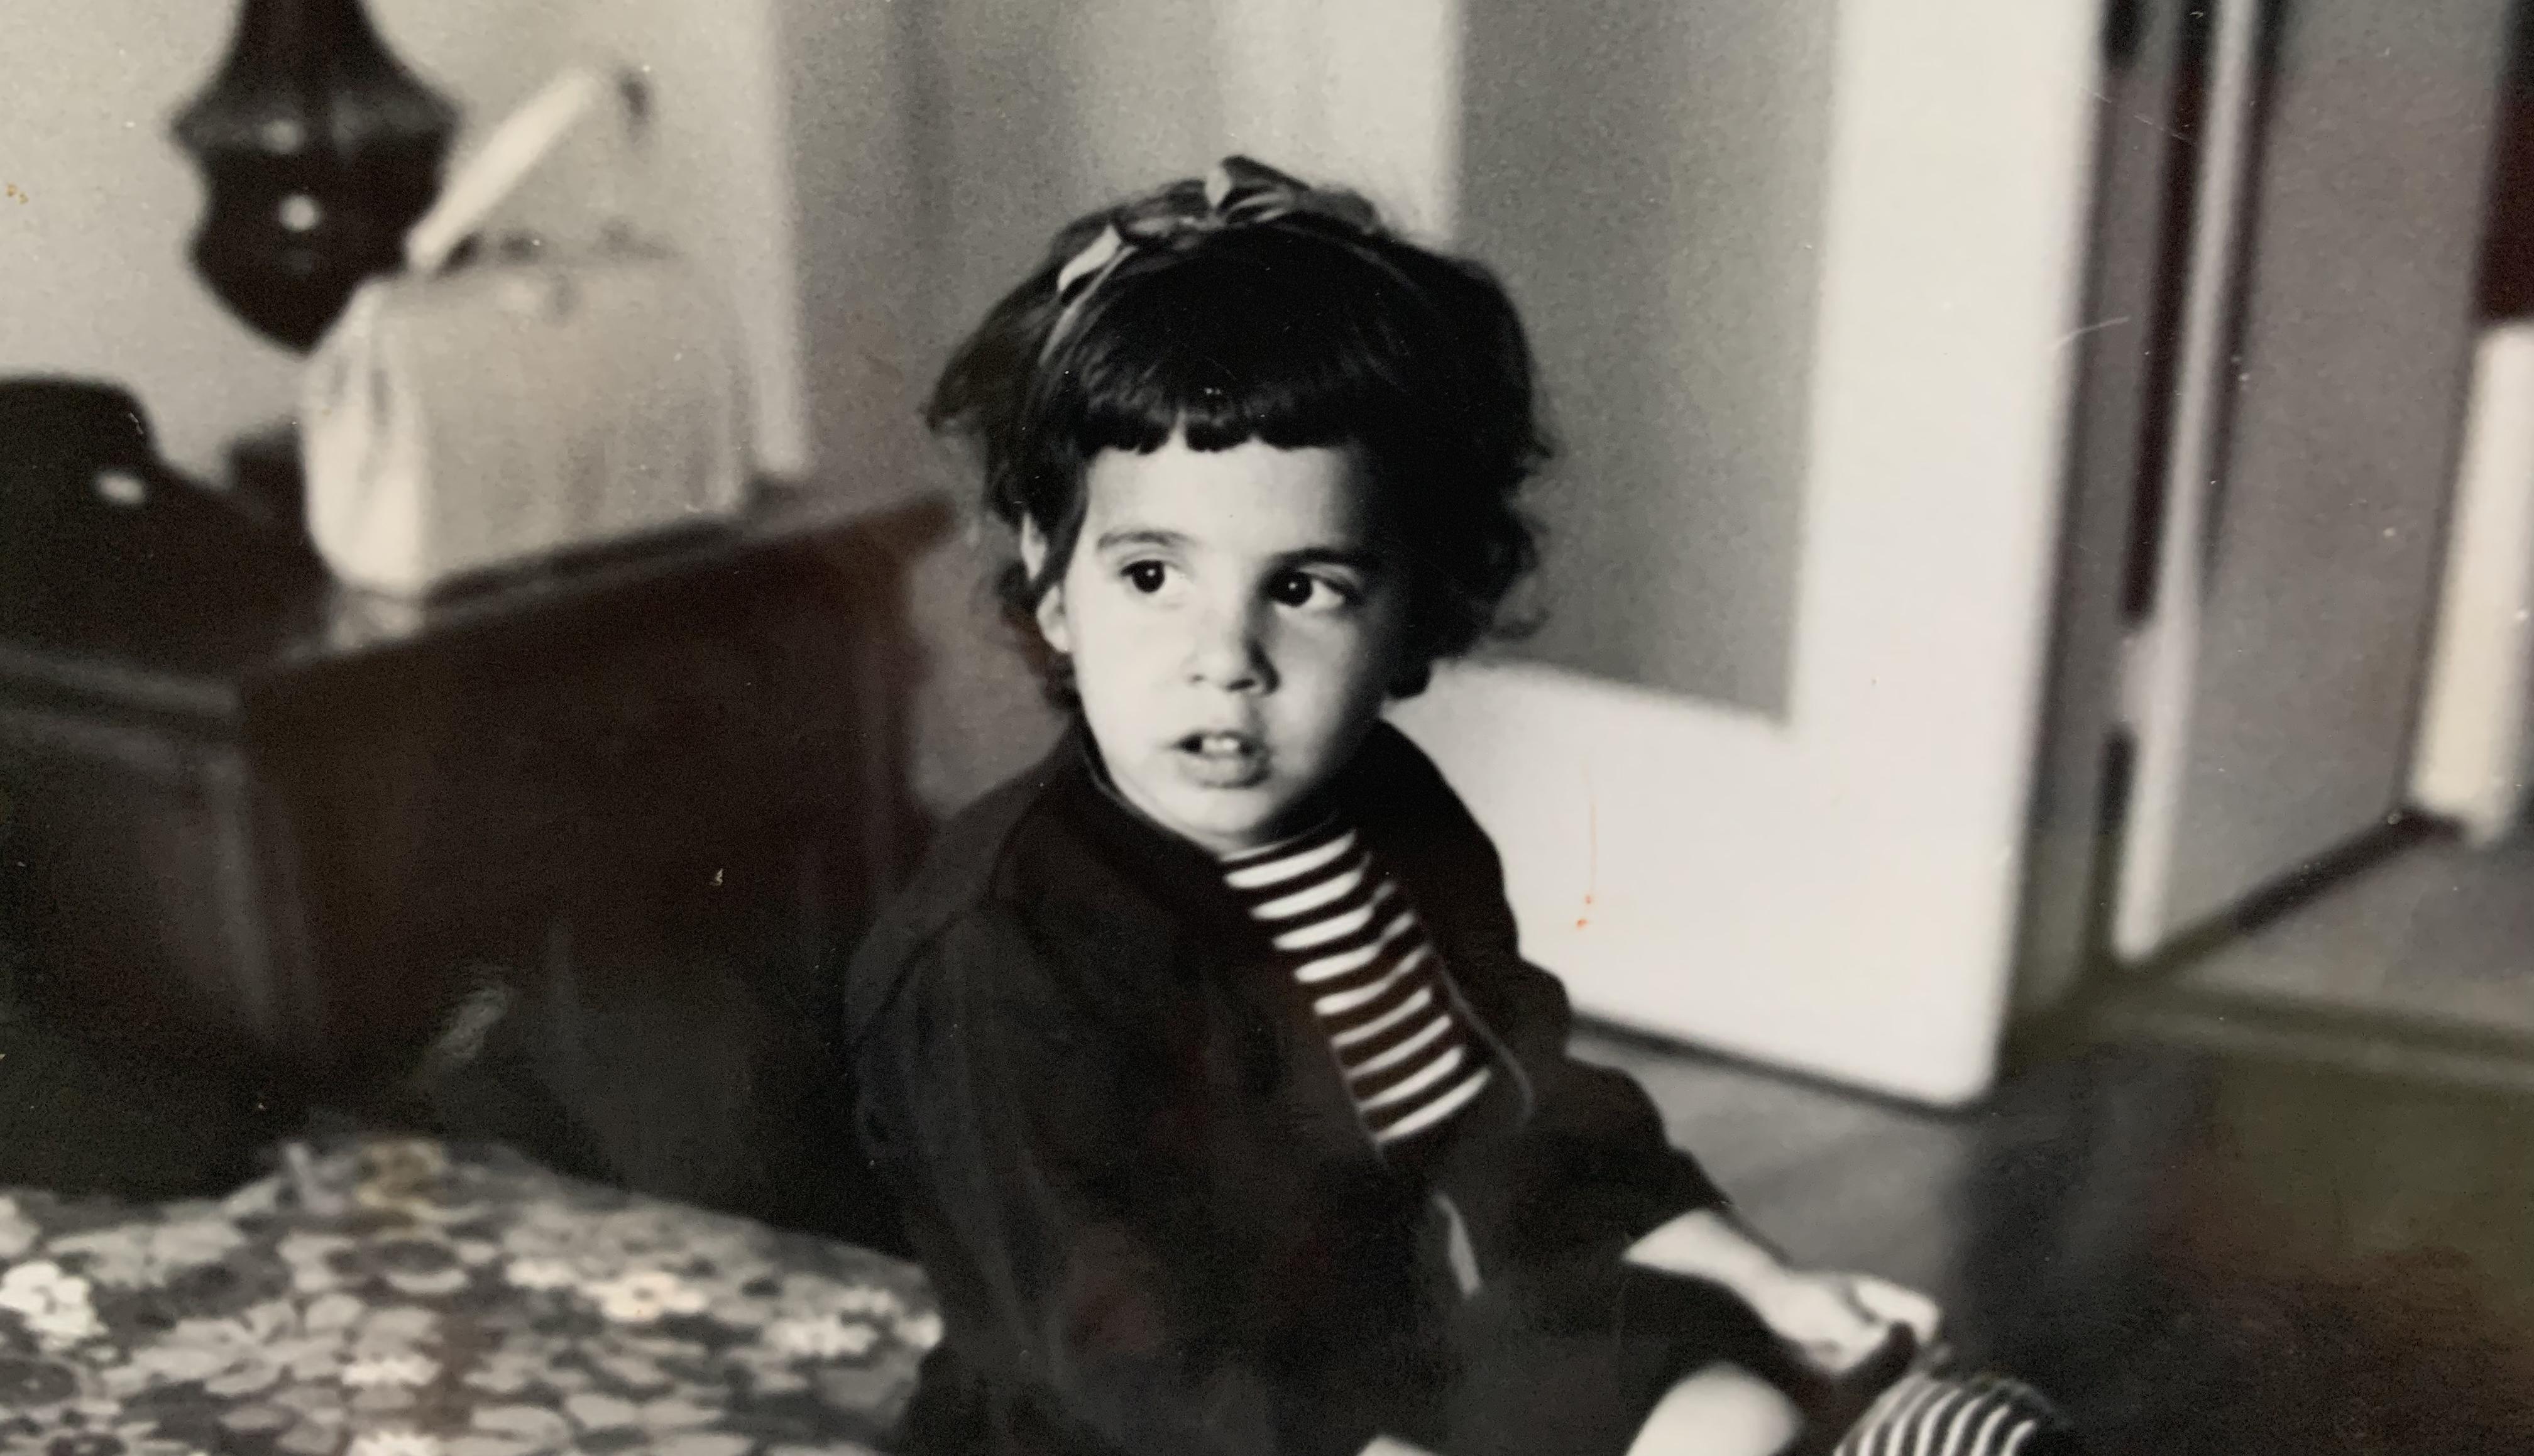 Laura Zinn Fromm as a child